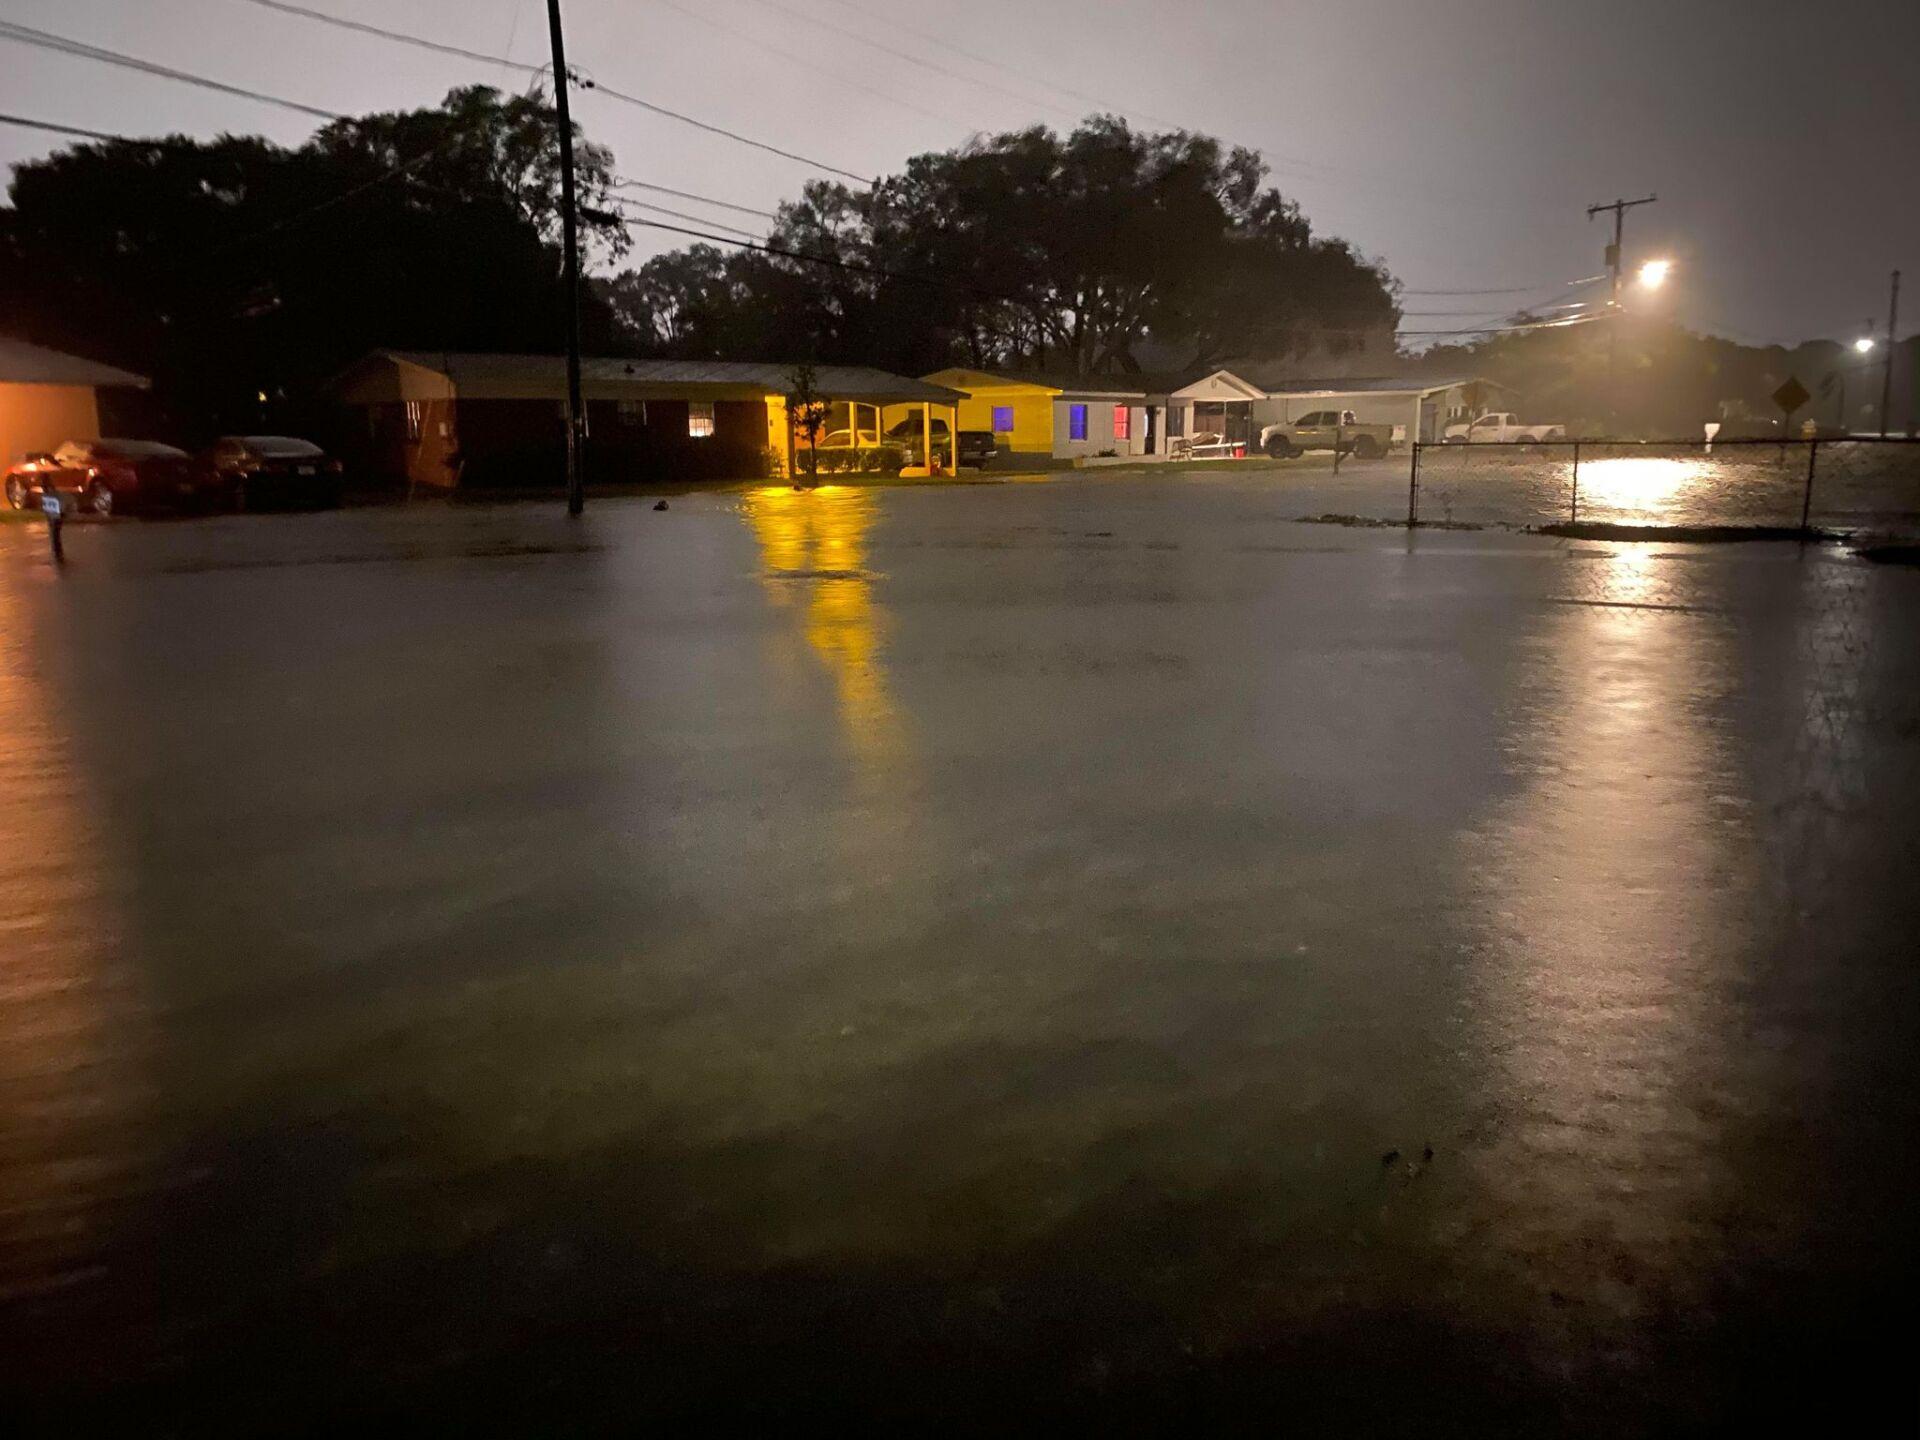 Oldsmar_Mobbly Bayou Flooding_Holli Purcell 3.jpg